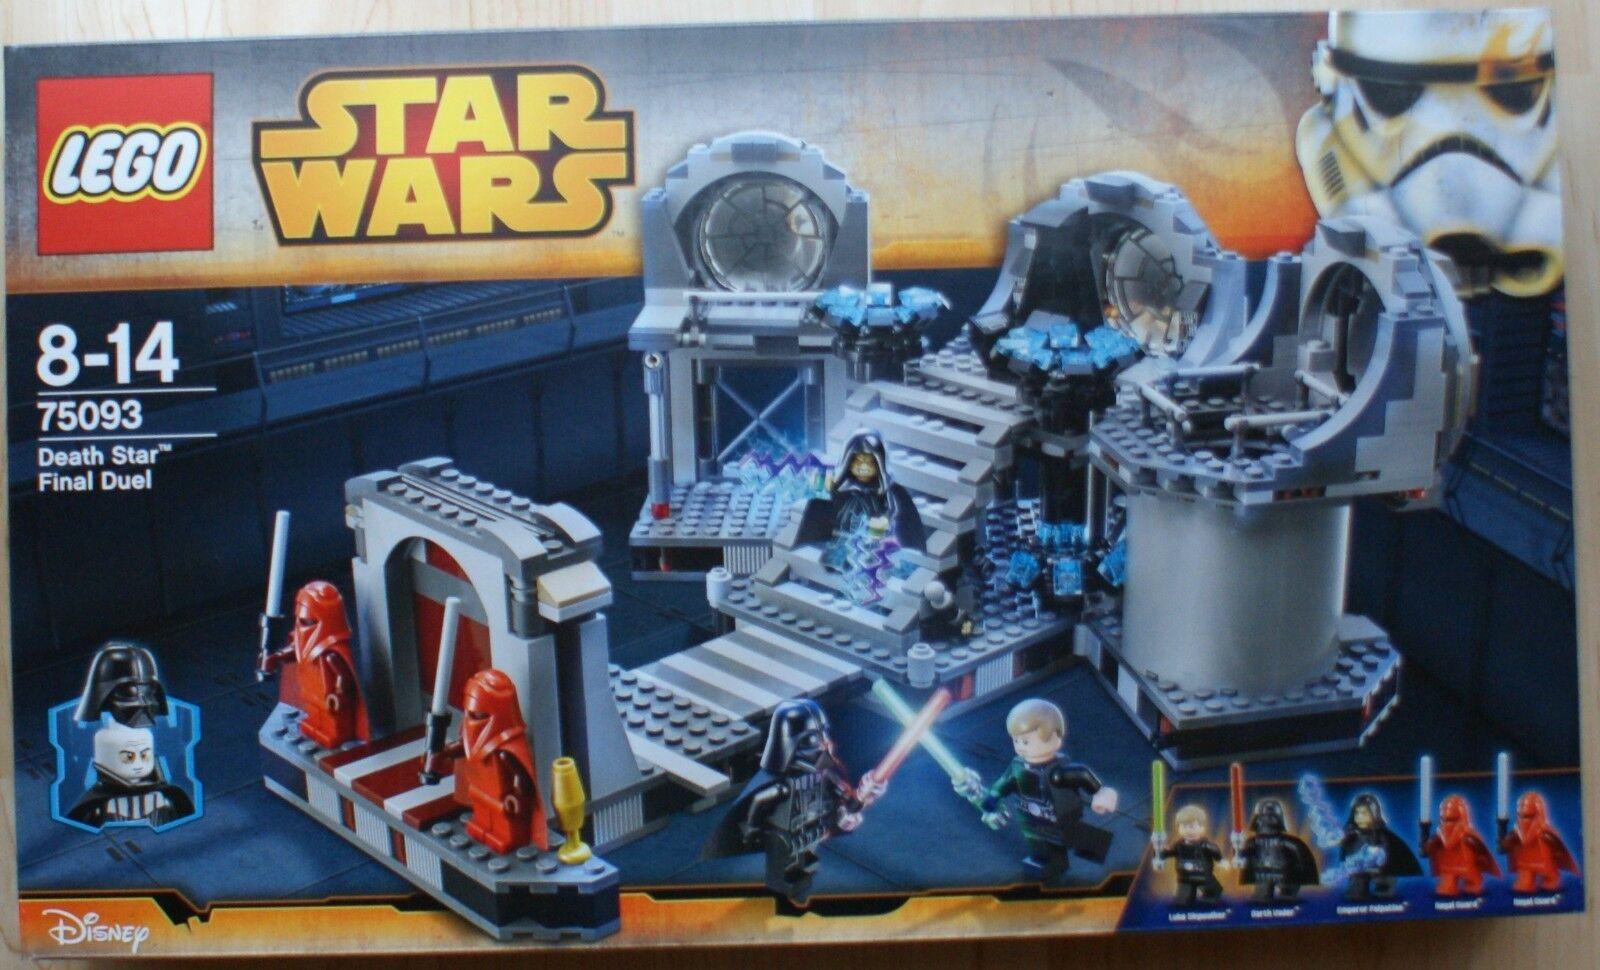 Lego - Star Wars - 75093 - Death Star Final Duel - NEU - KOMPLETT - OVP